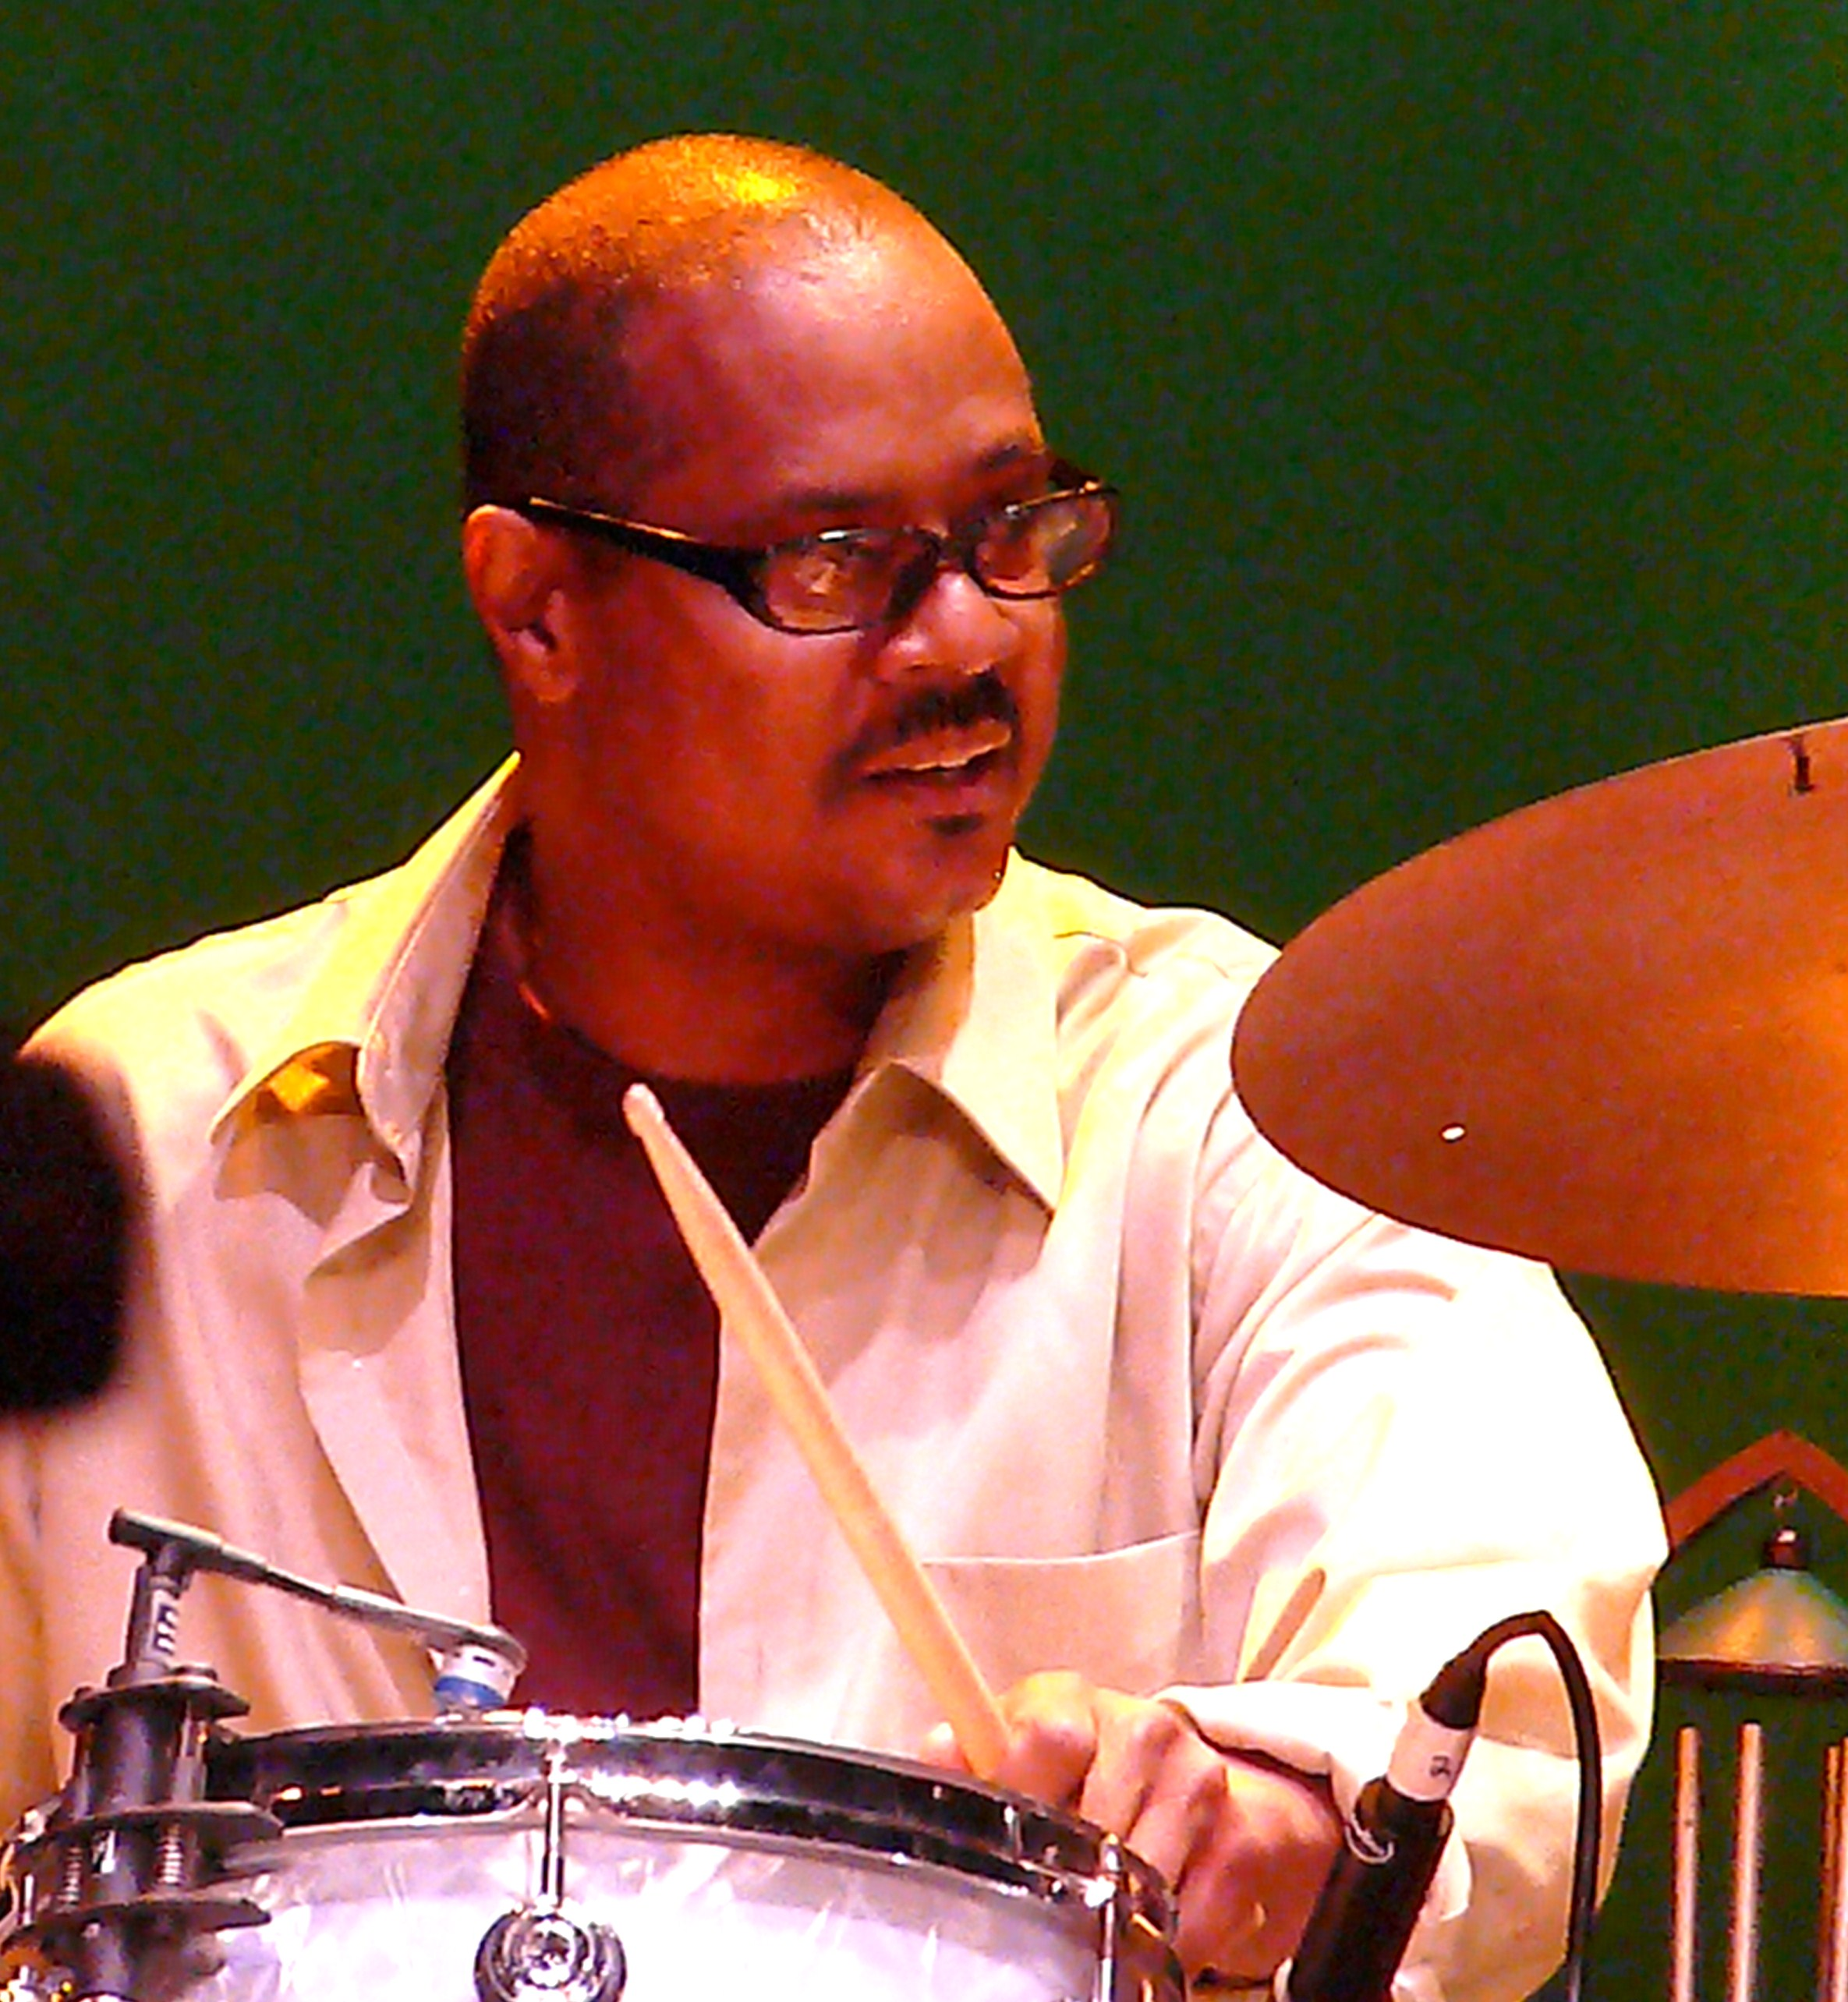 Reggie Nicholson at Vision Festival 2010